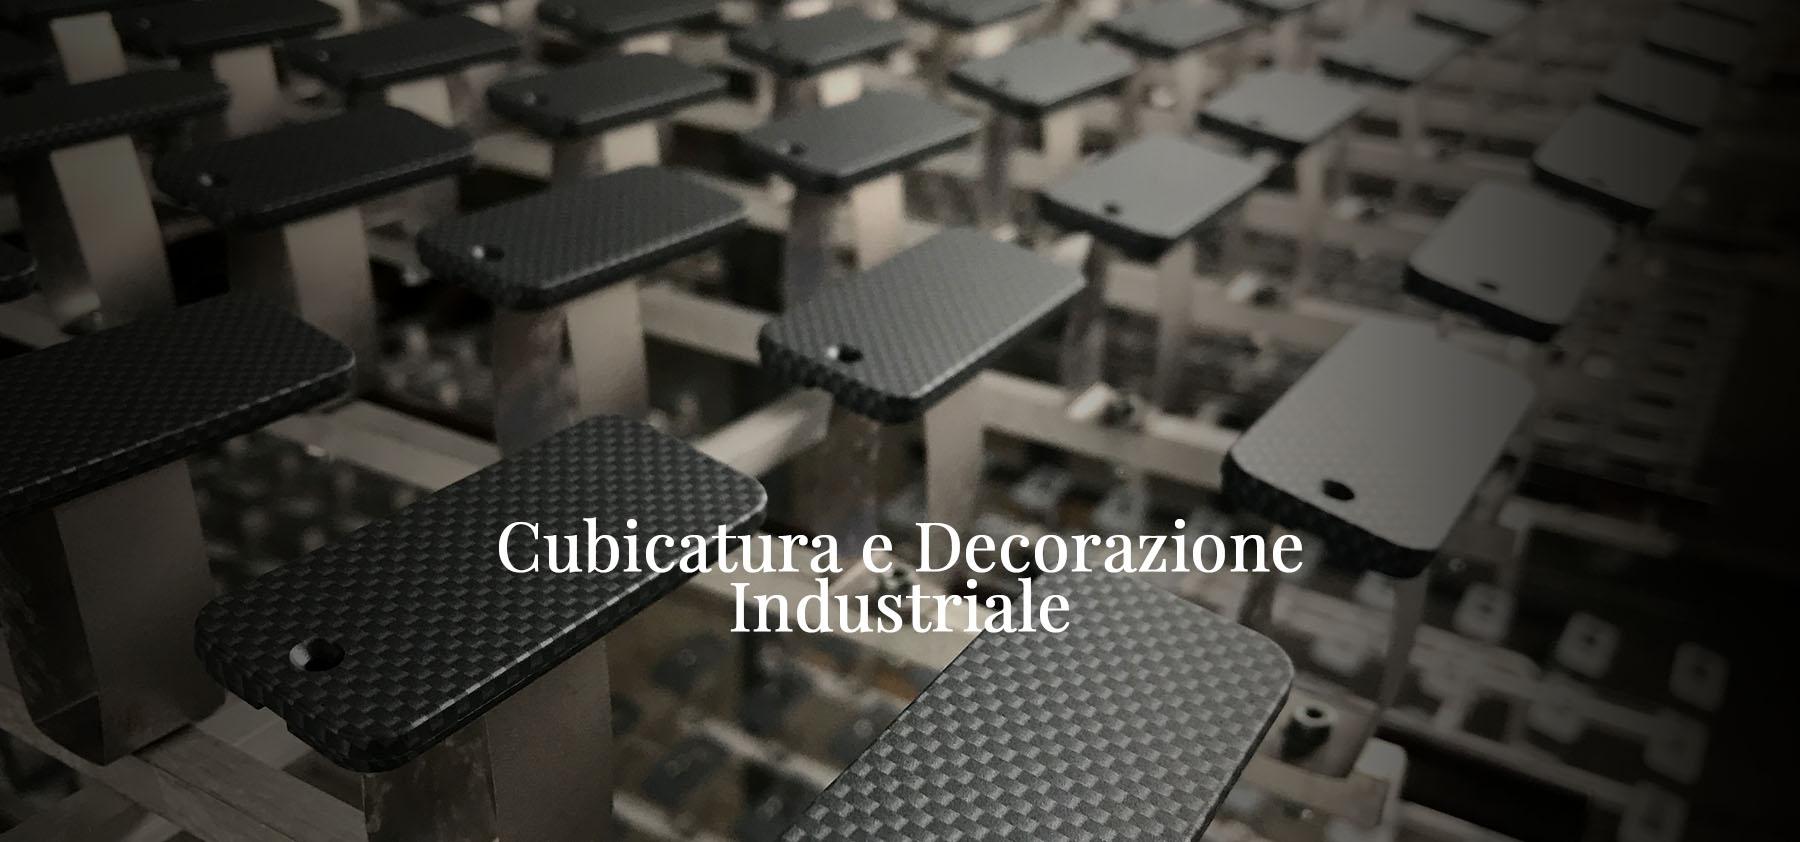 cubicatura industriale